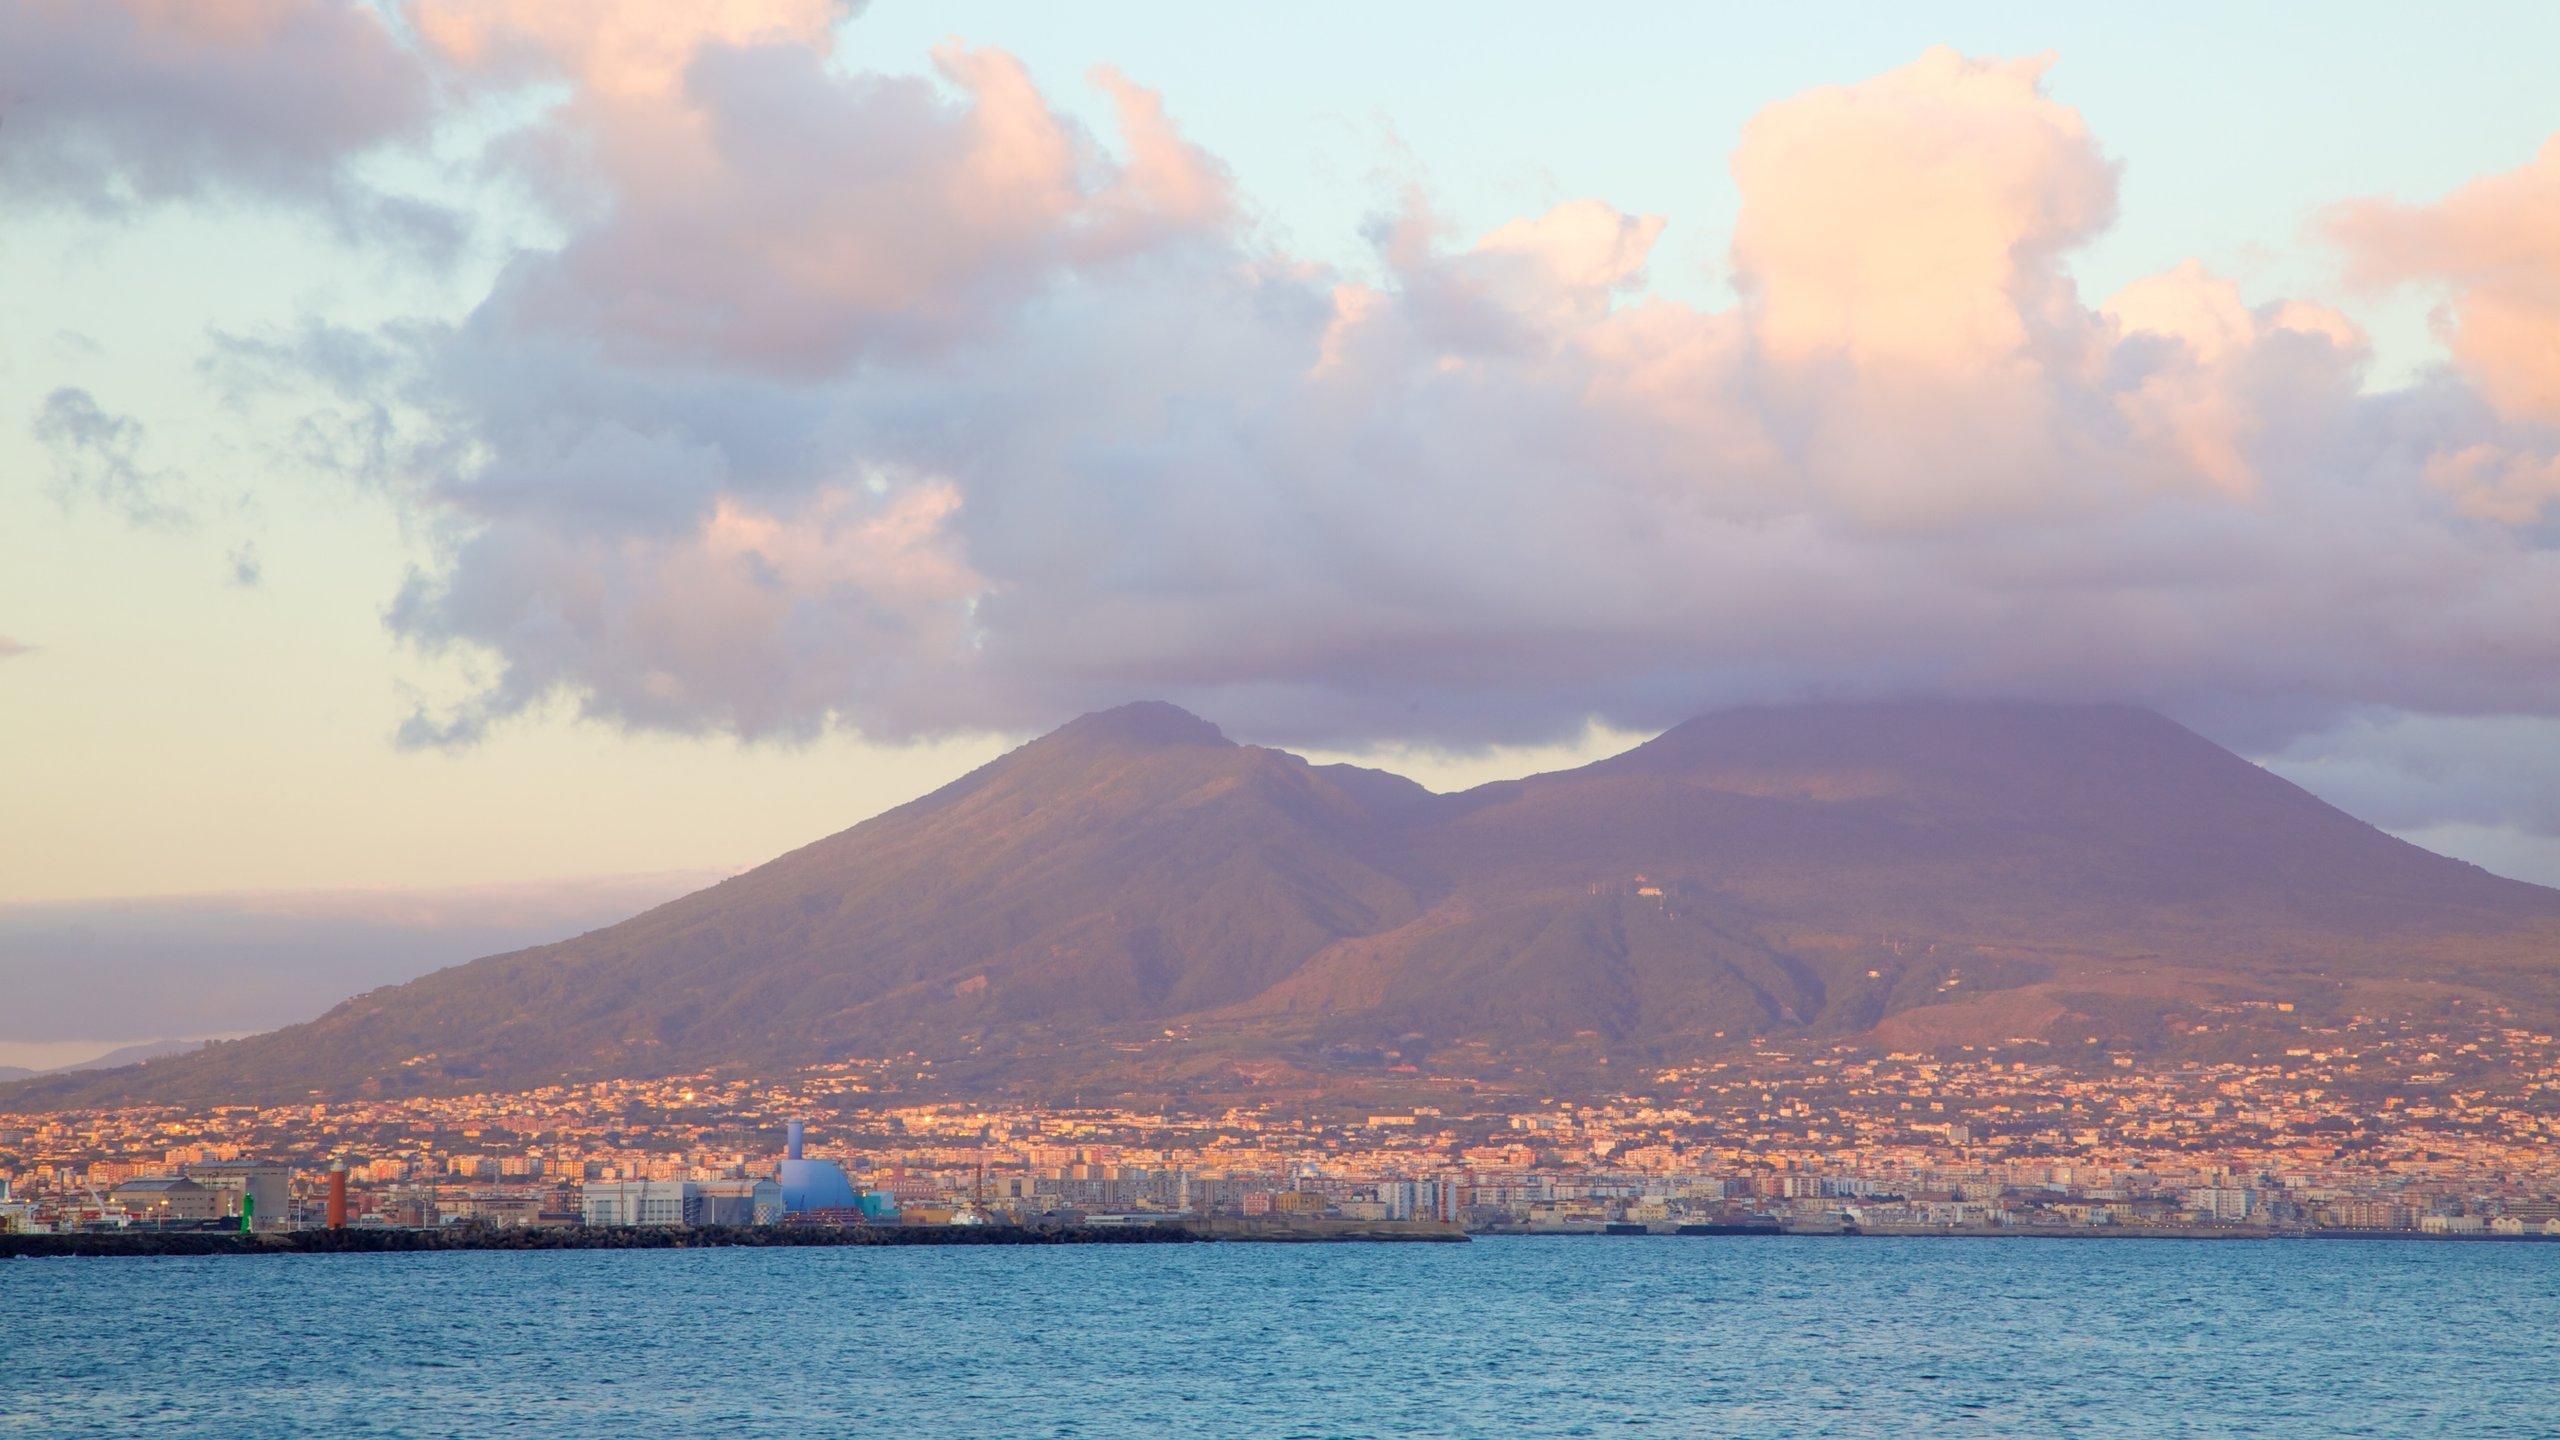 10 Best Spas in Mount Vesuvius - Pompei $64: Spa Hotels & Resorts in 2019